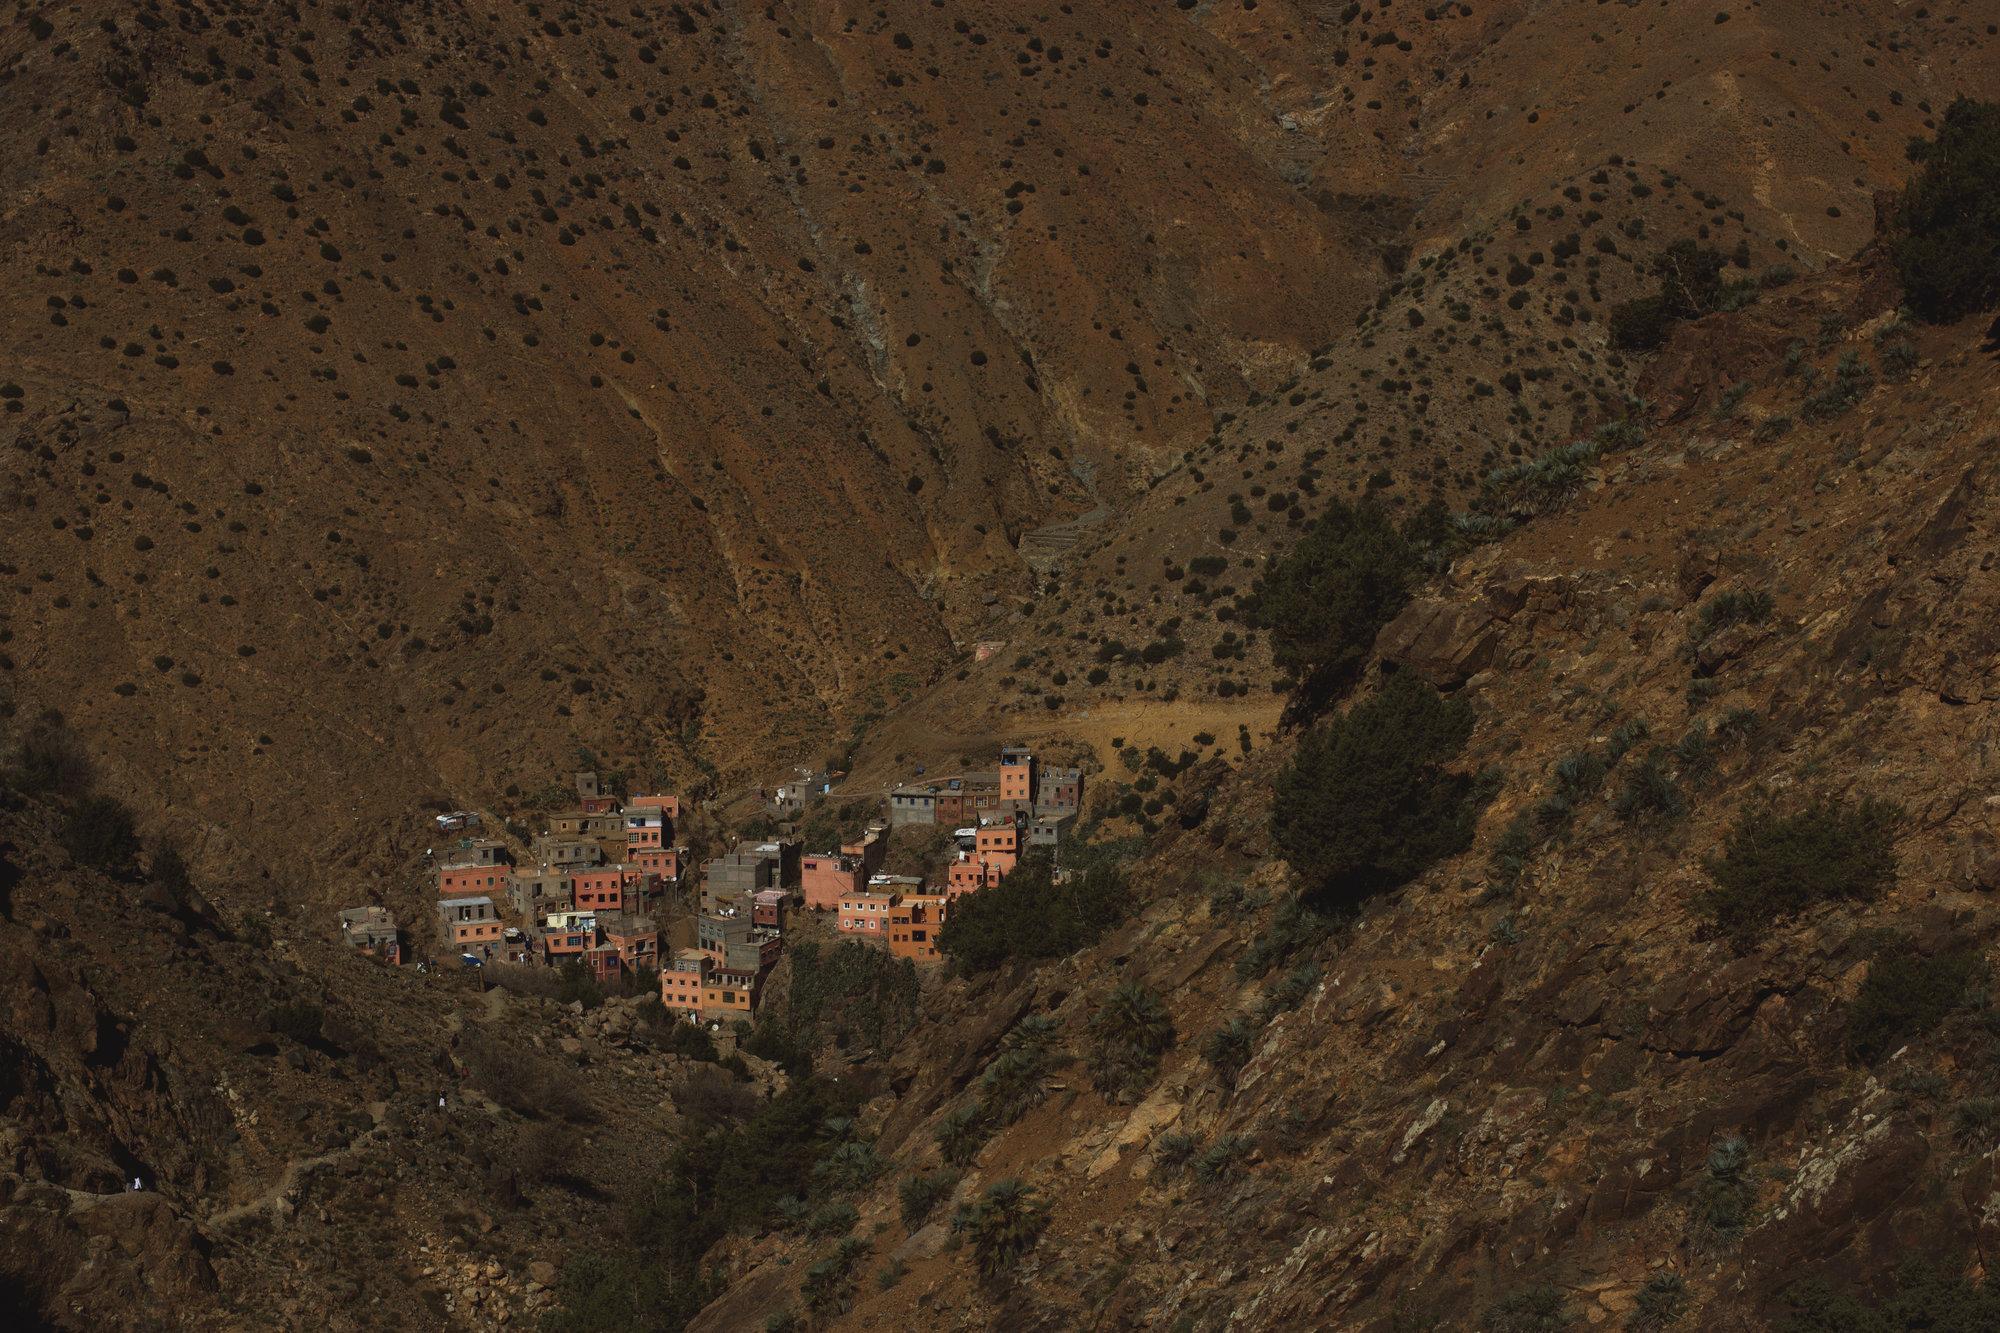 pohled na vesnici Setti Fatma